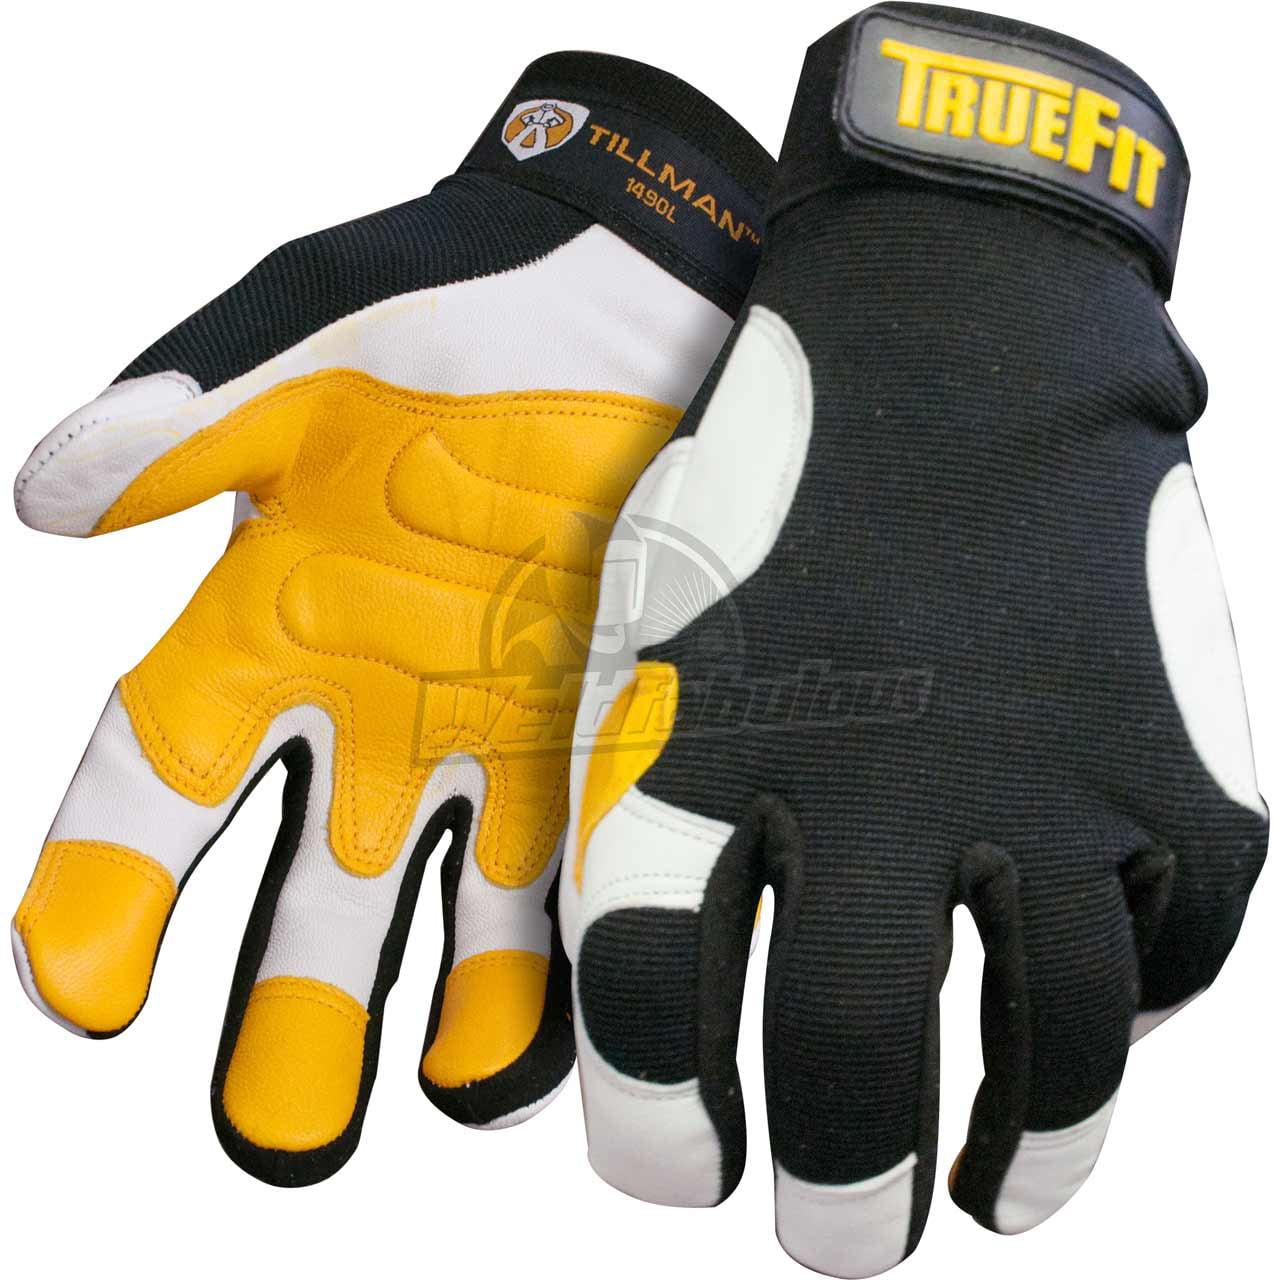 Tillman leather work gloves - Tillman 1490 Ultra True Fit Premium Top Grain Goatskin Work Gloves